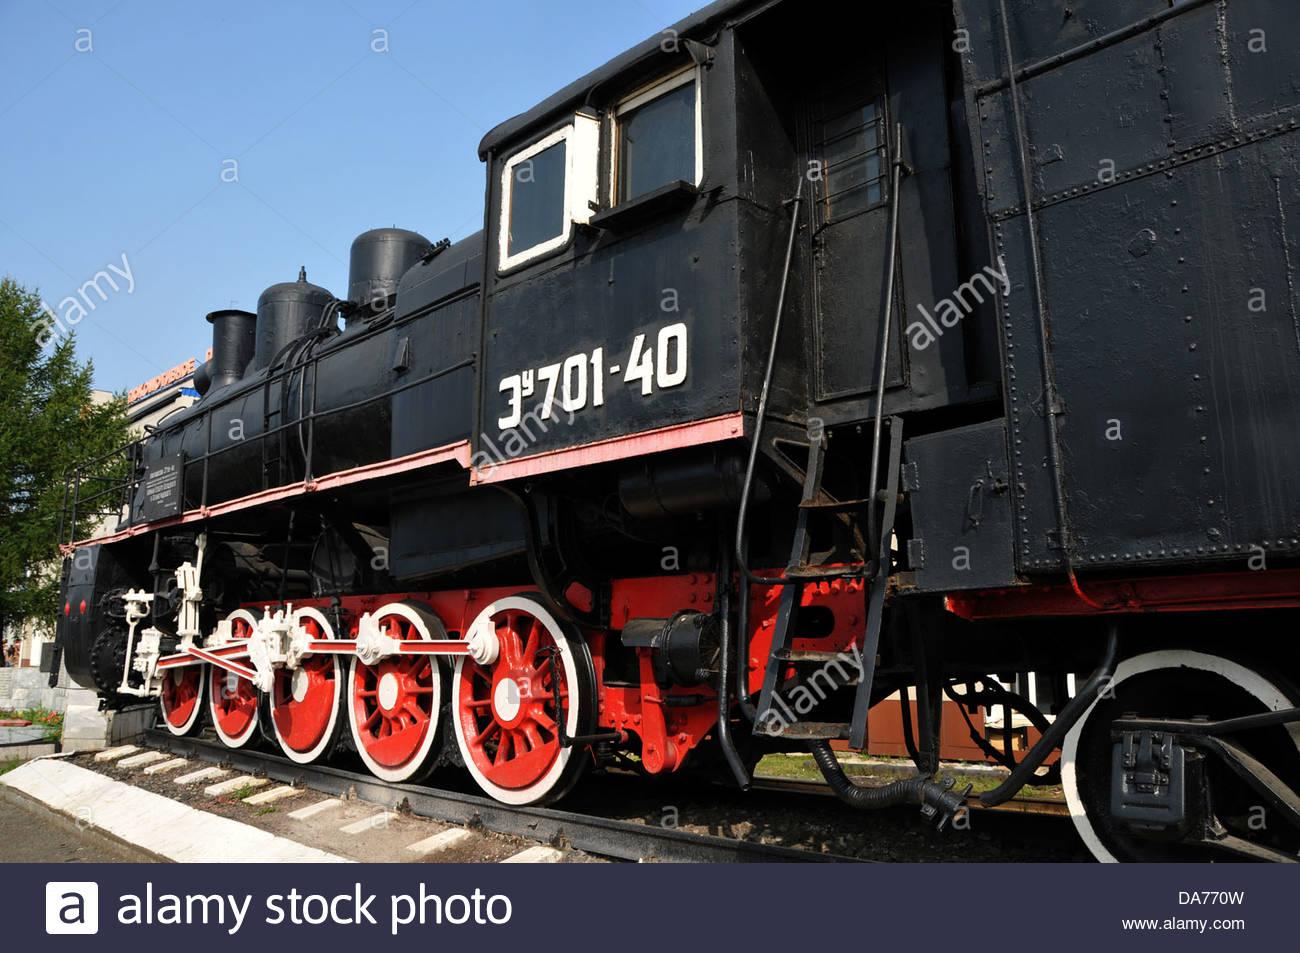 storage of old locomotives of Russian Railways RZD in Ekaterinburg,Siberia,Russia - Stock Image